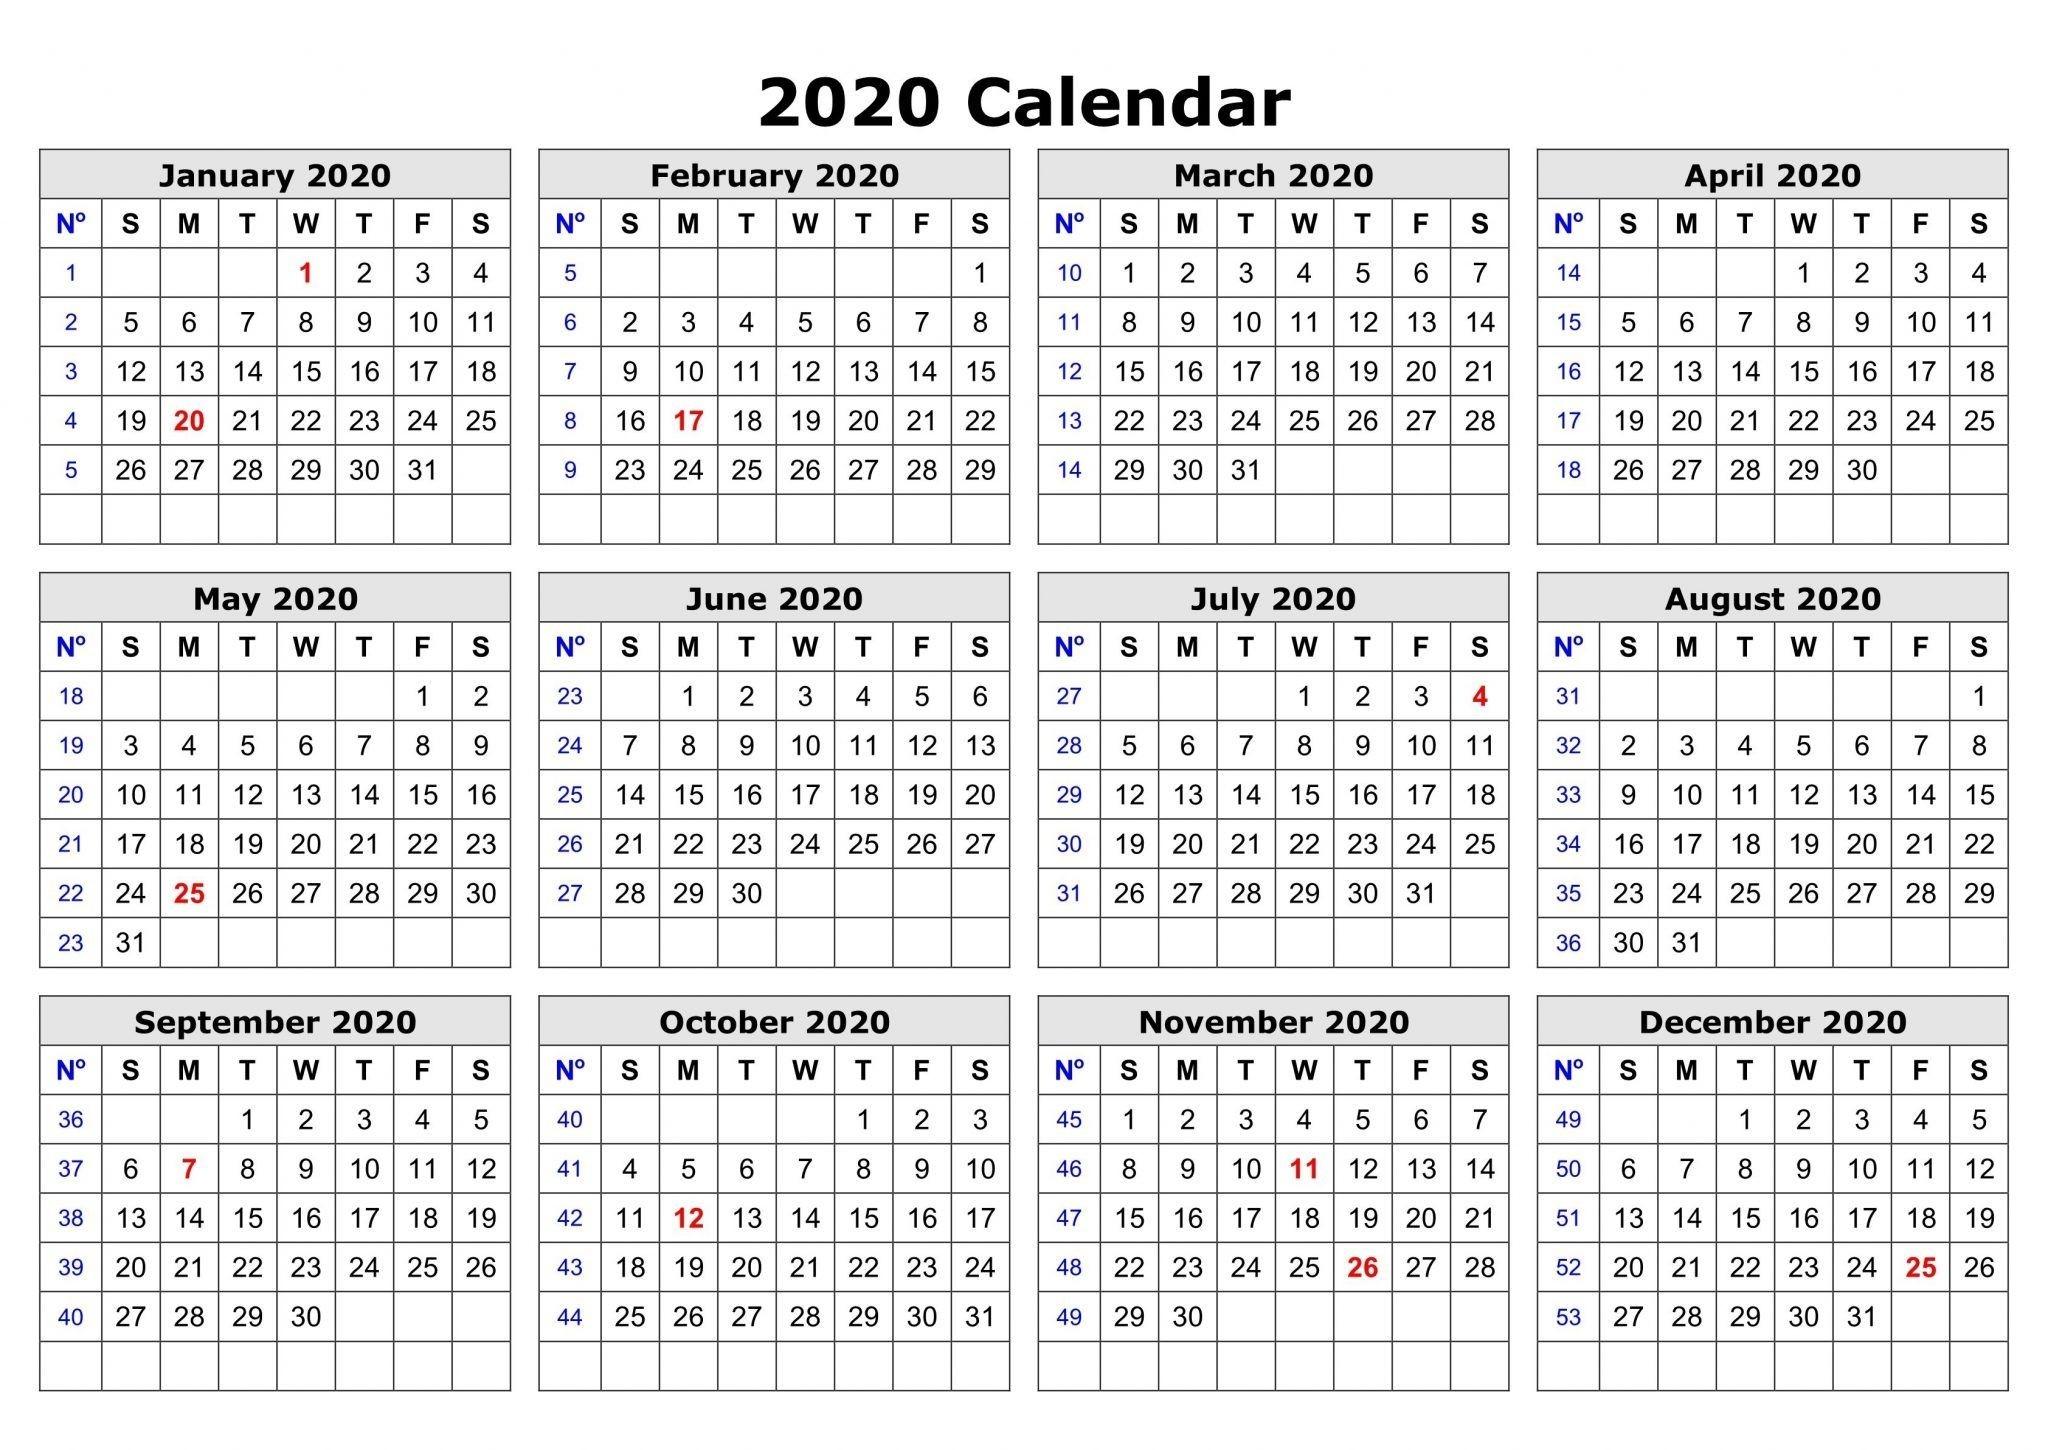 2020 Printable Calendar | Printable Calendar Template, Free-Microsoft Word Template 2020 Calendar